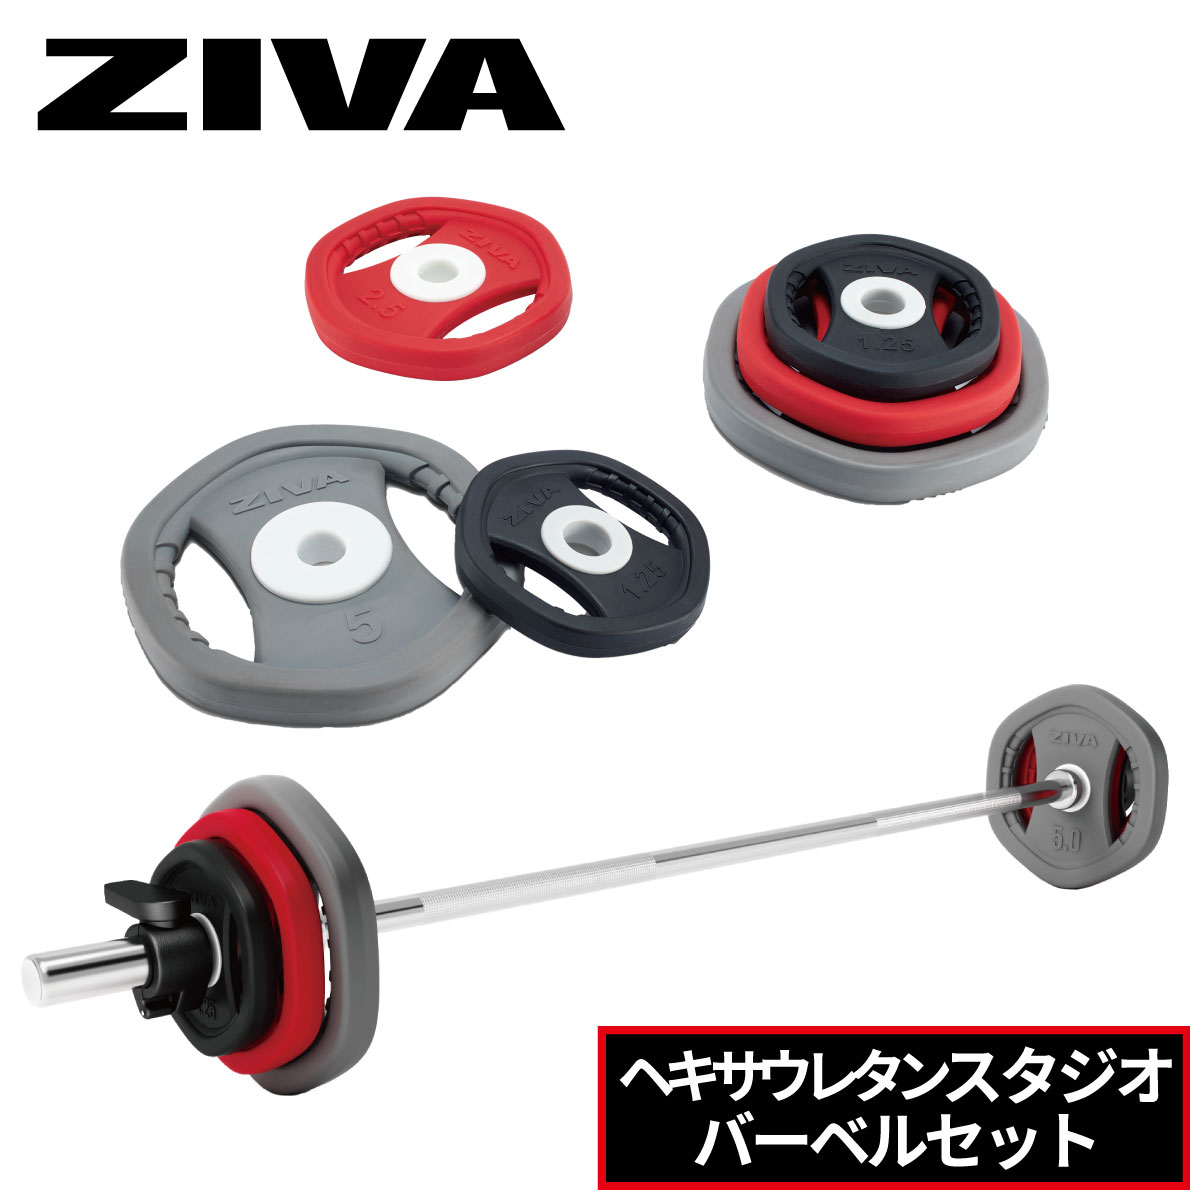 《ZIVA ジーヴァ 》ヘキサウレタン 限定モデル スタジオバーベルセット ZVO-PHBS-1627 返品不可 ウエイトリフティング フリーウエイト ヘキサウレタンスタジオバーベルセット ウレタンコーティング ZIVA バーベルセット トレーニング ウエイトディスク カラー 18kg バー